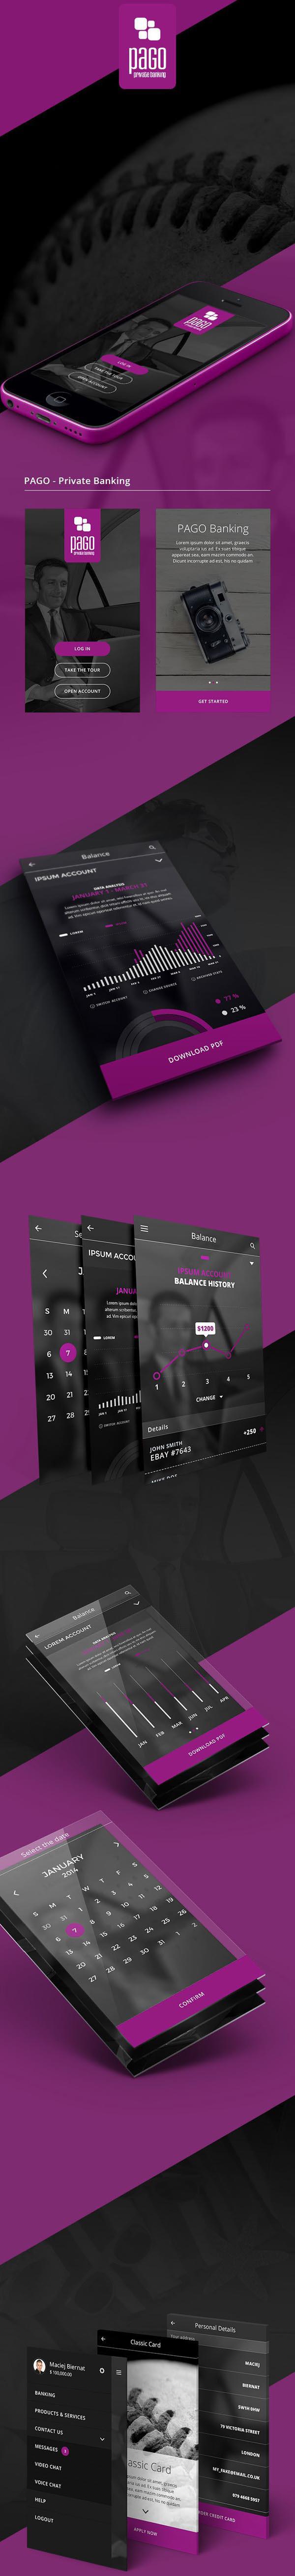 Mobile Banking by Maciej Biernat